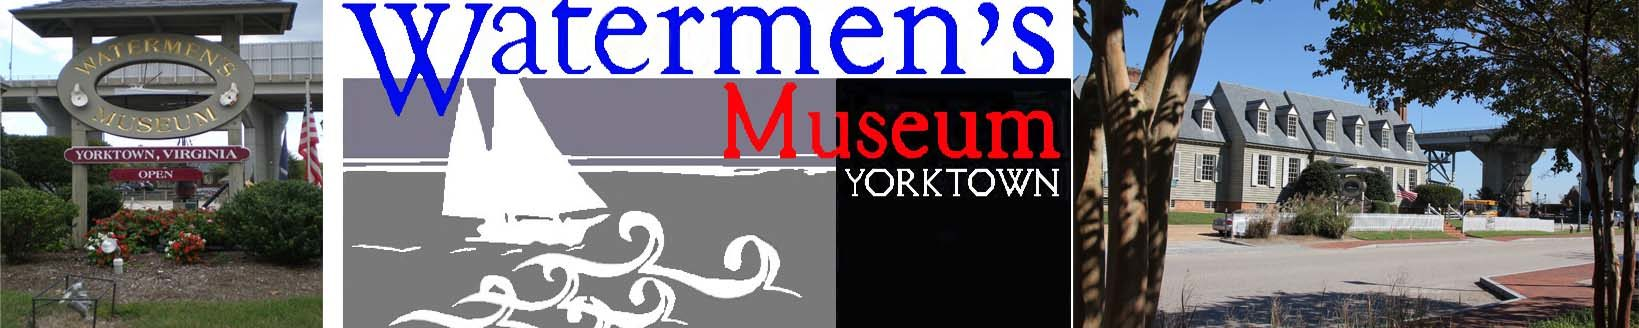 The Watermen's Museum